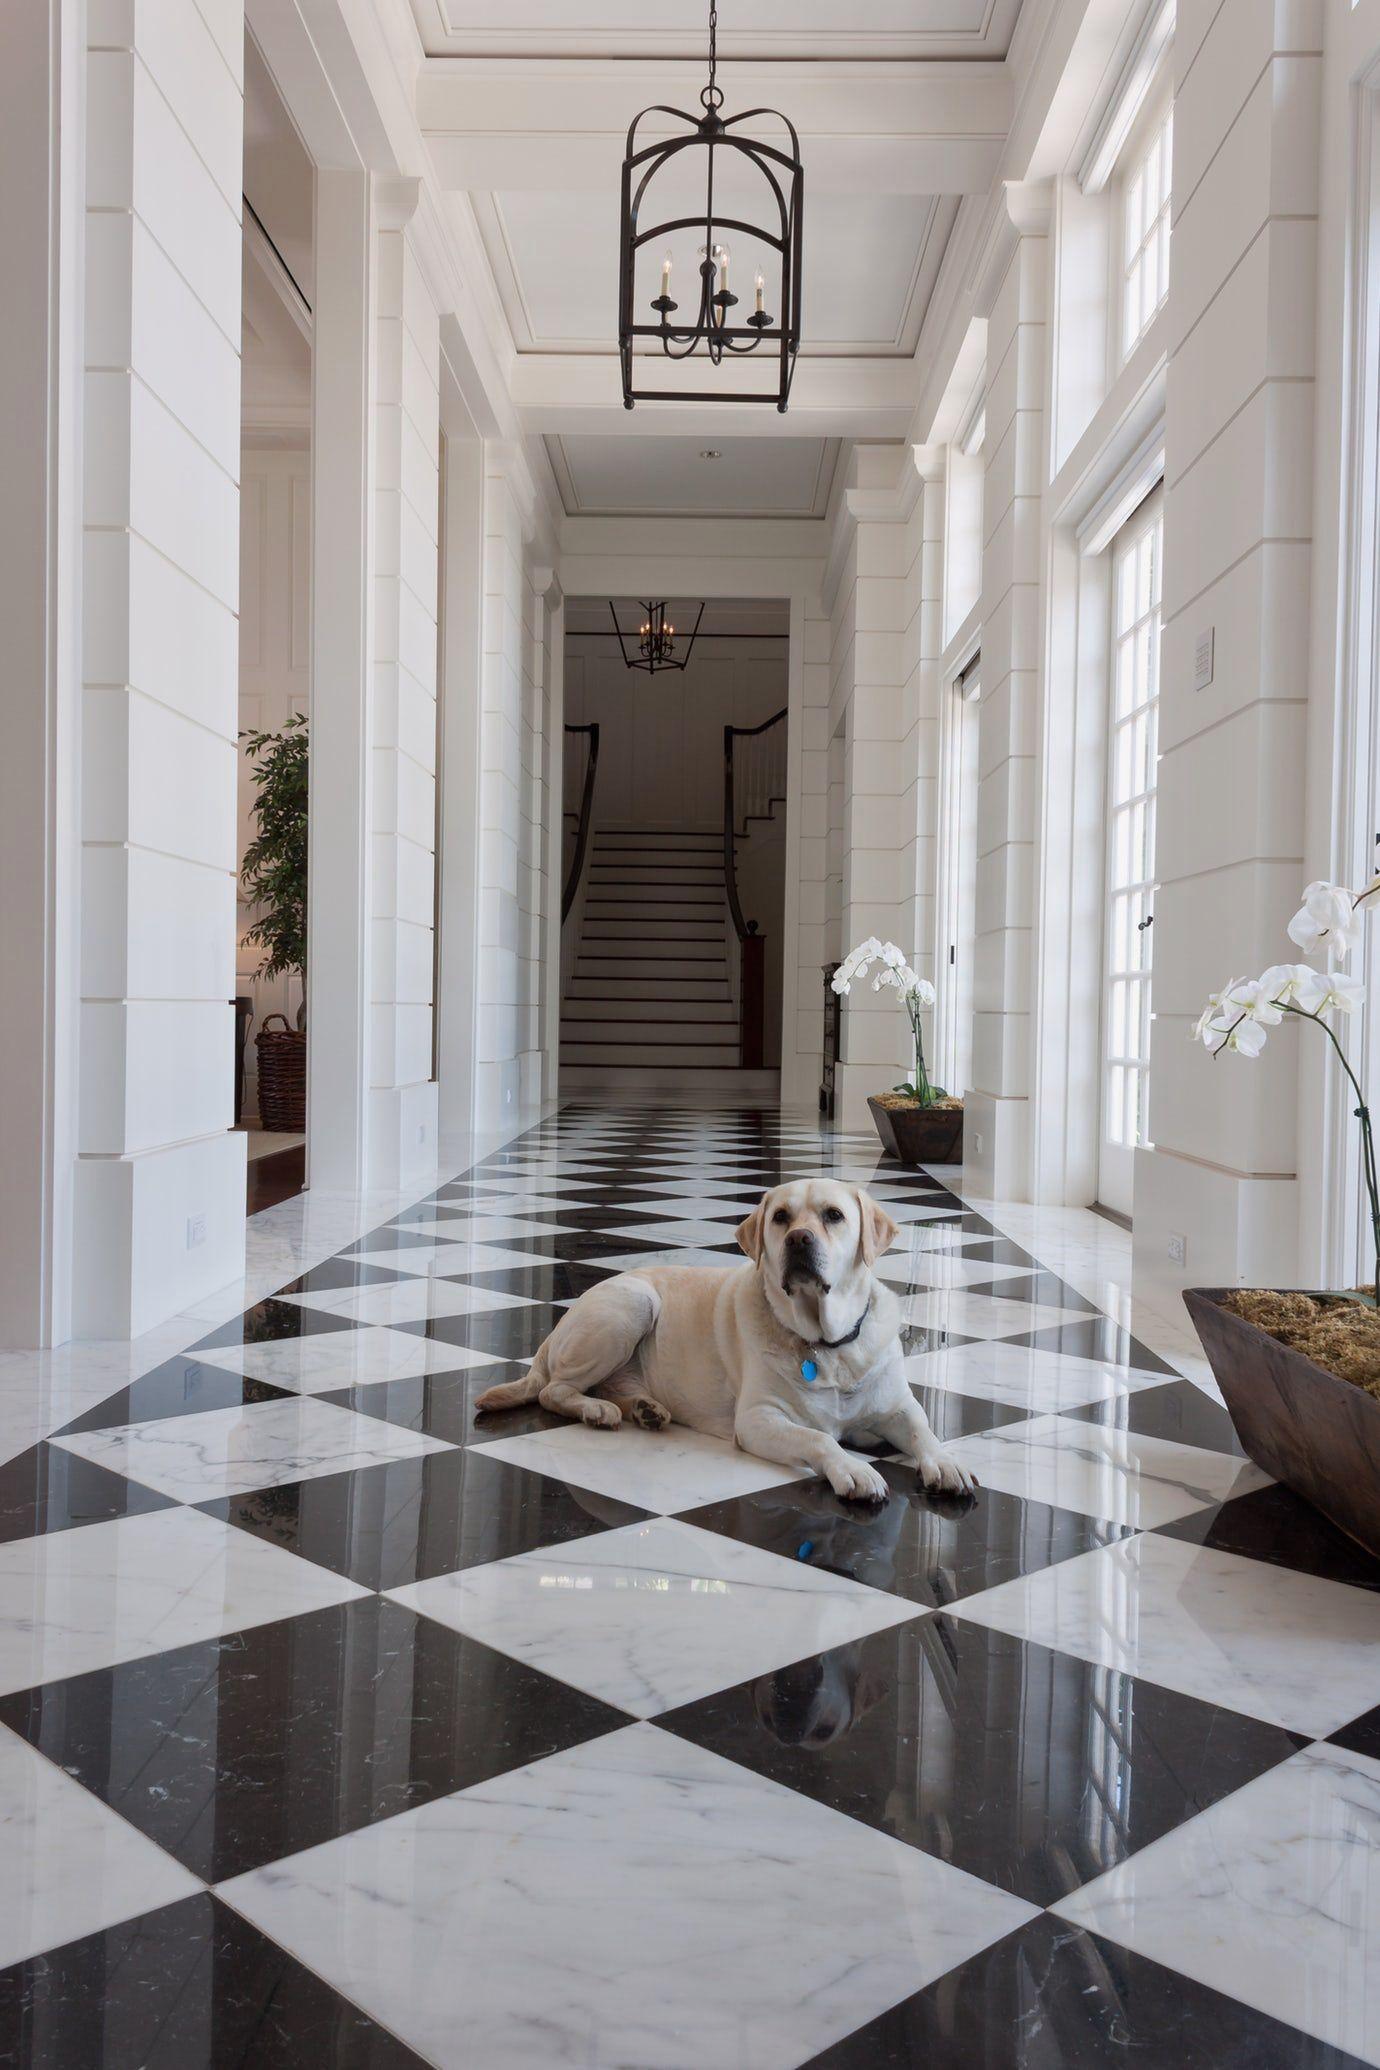 14 Sunny Gray Marble Floor Design   White Marble Floor, Marble House, Black And White Hallway